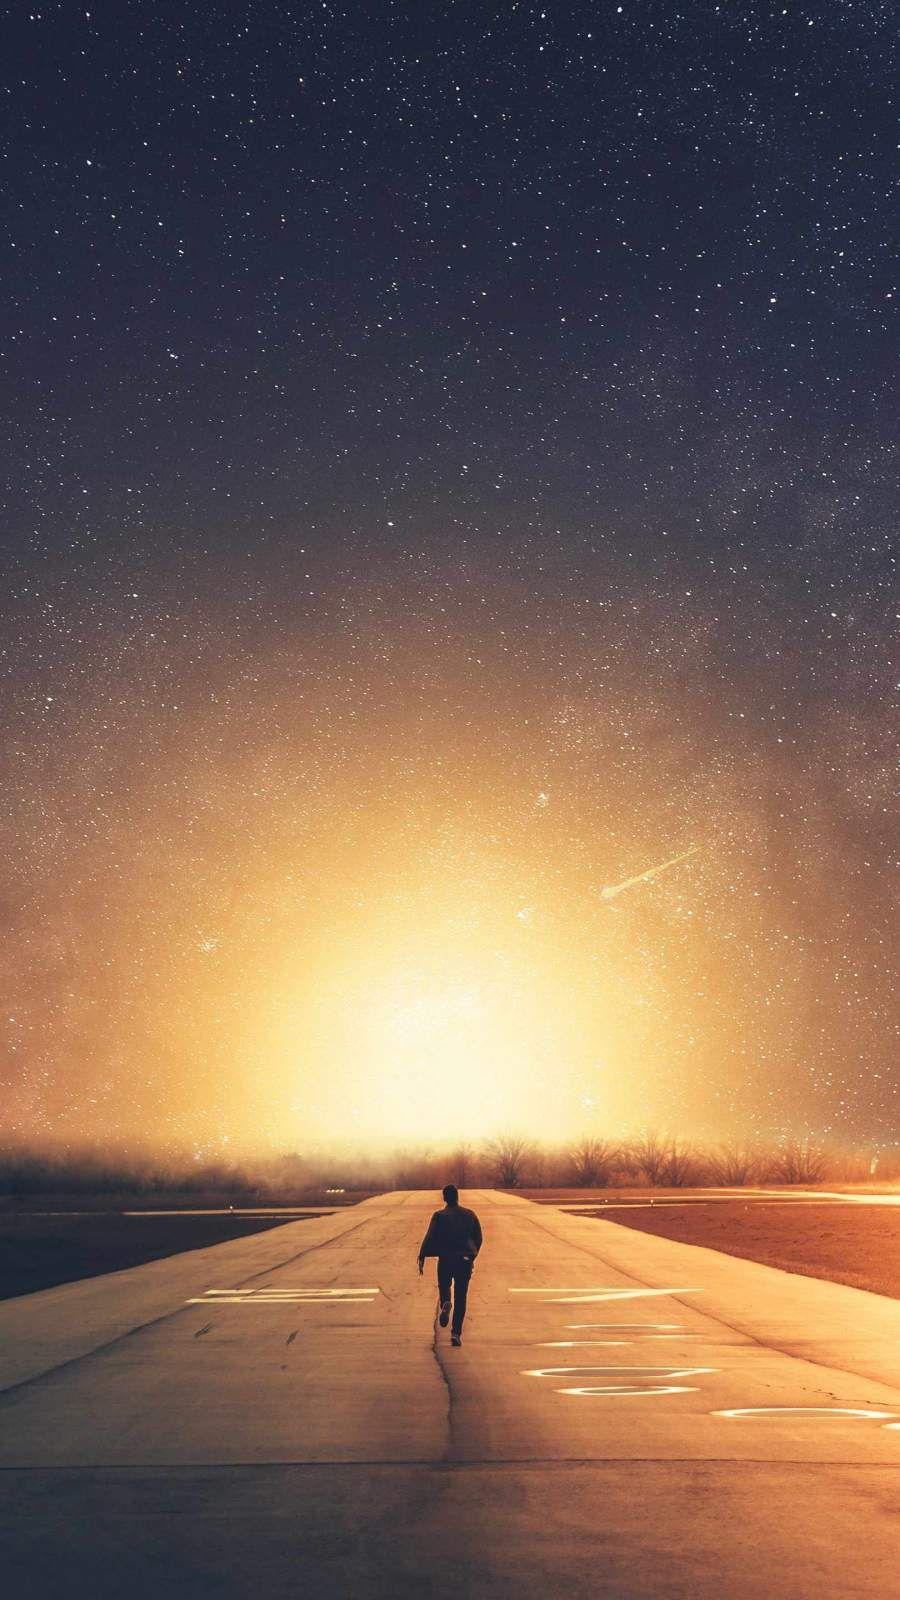 Dream World IPhone Wallpaper in 2020 Nature wallpaper